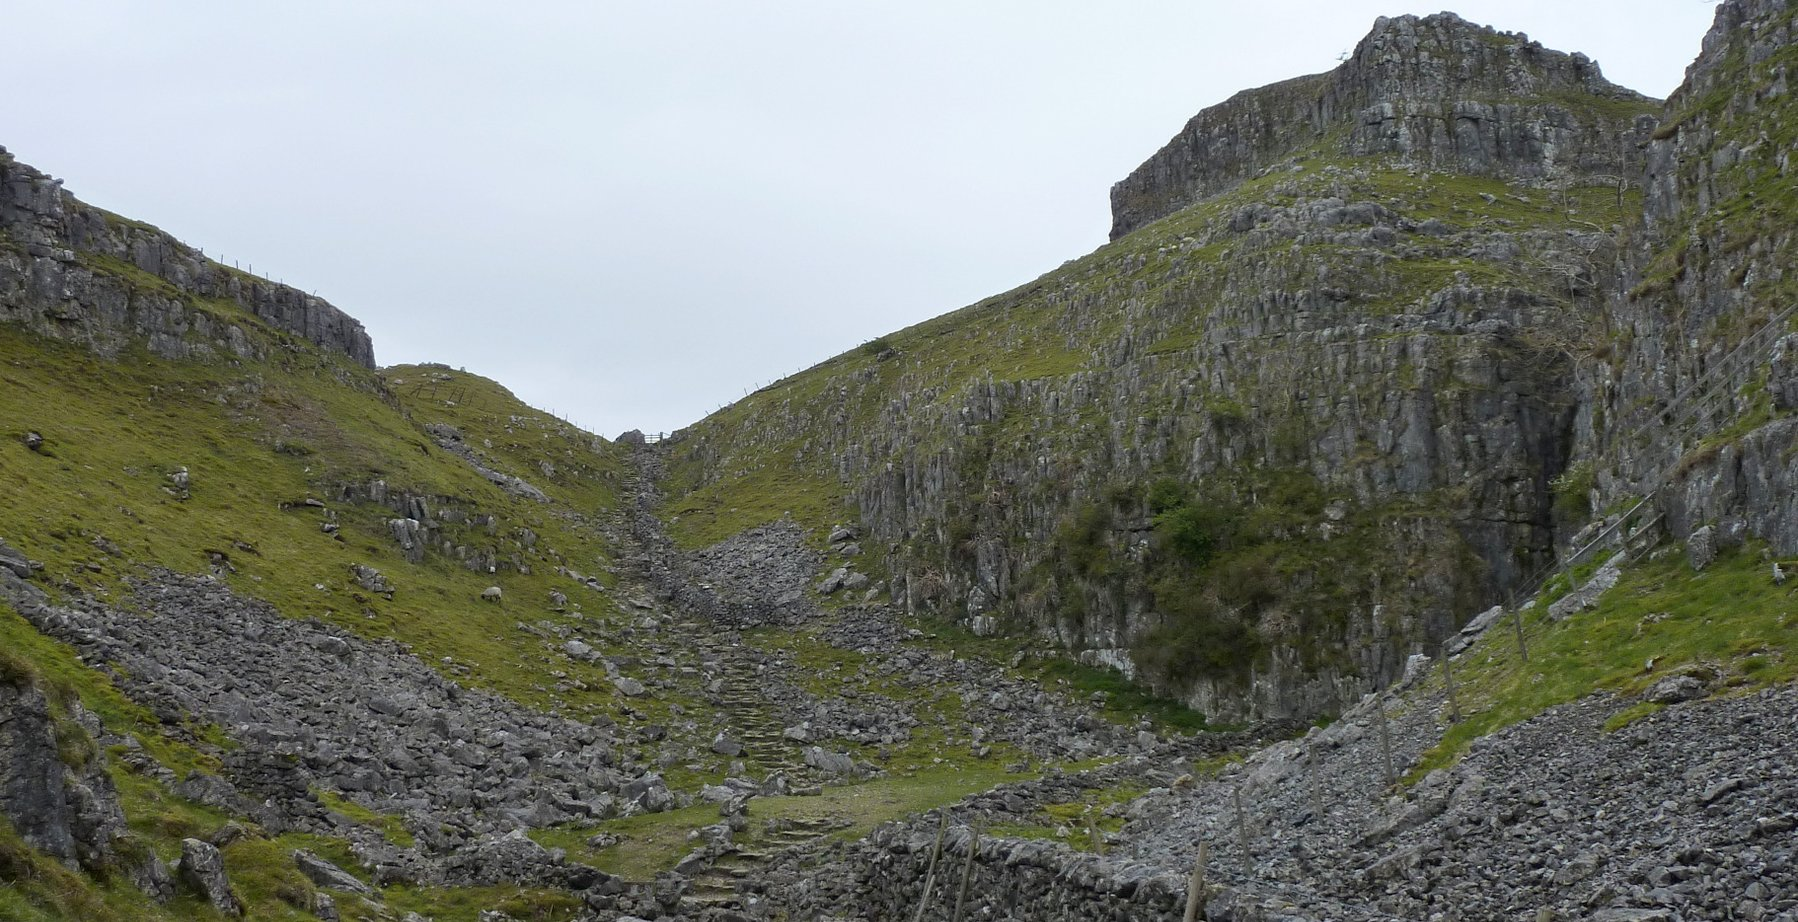 Leaving Watlowes on another steep flight of steps